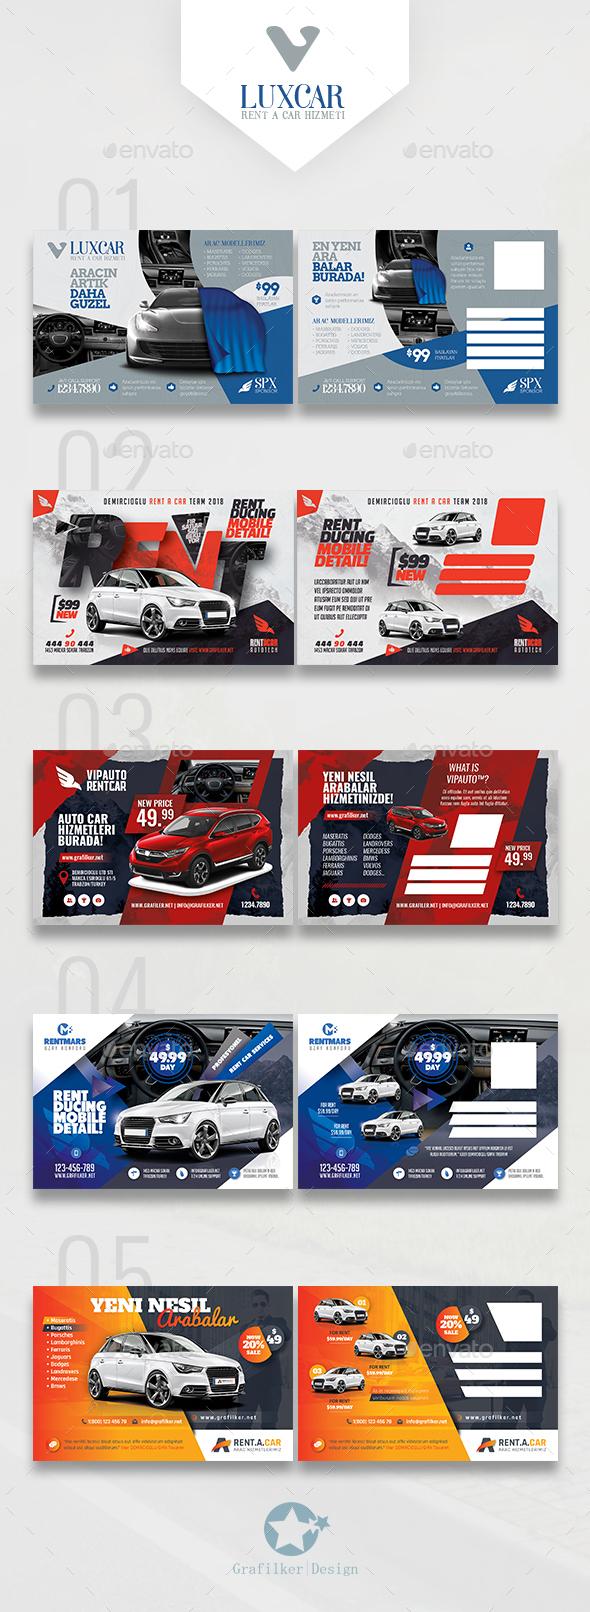 Rent A Car Bundle Postcard Templates - Cards & Invites Print Templates